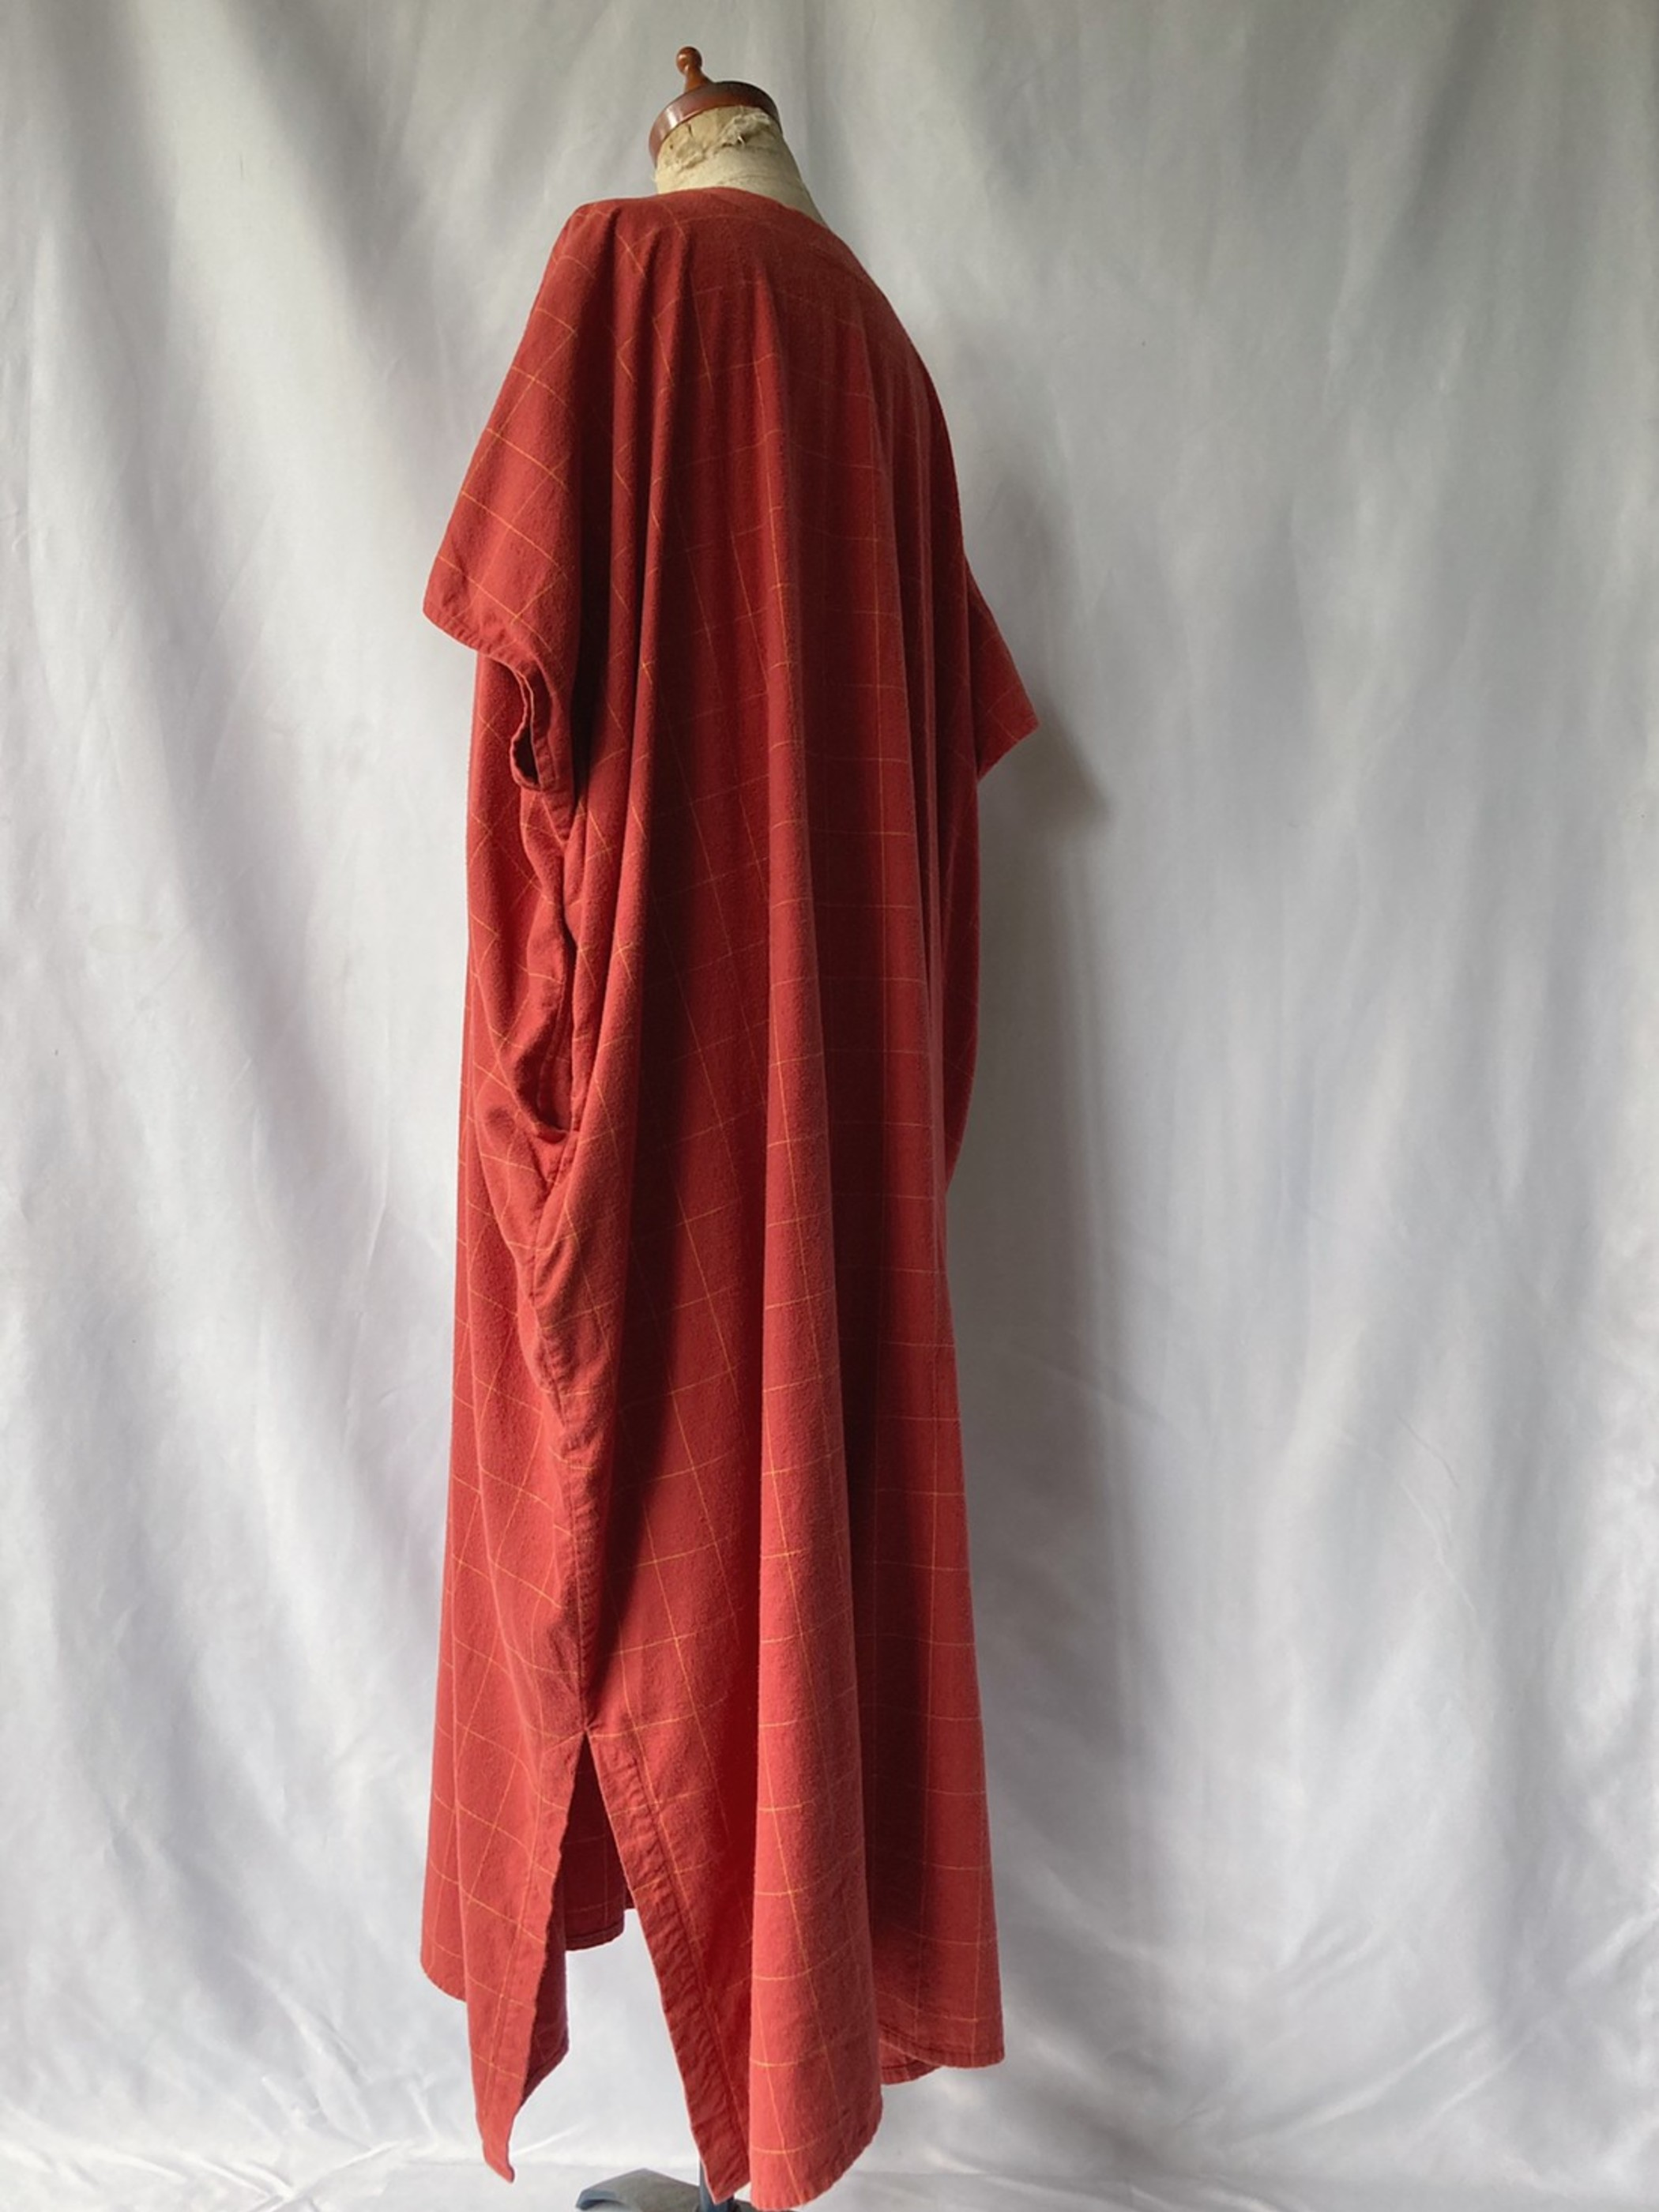 flannel plaid dress